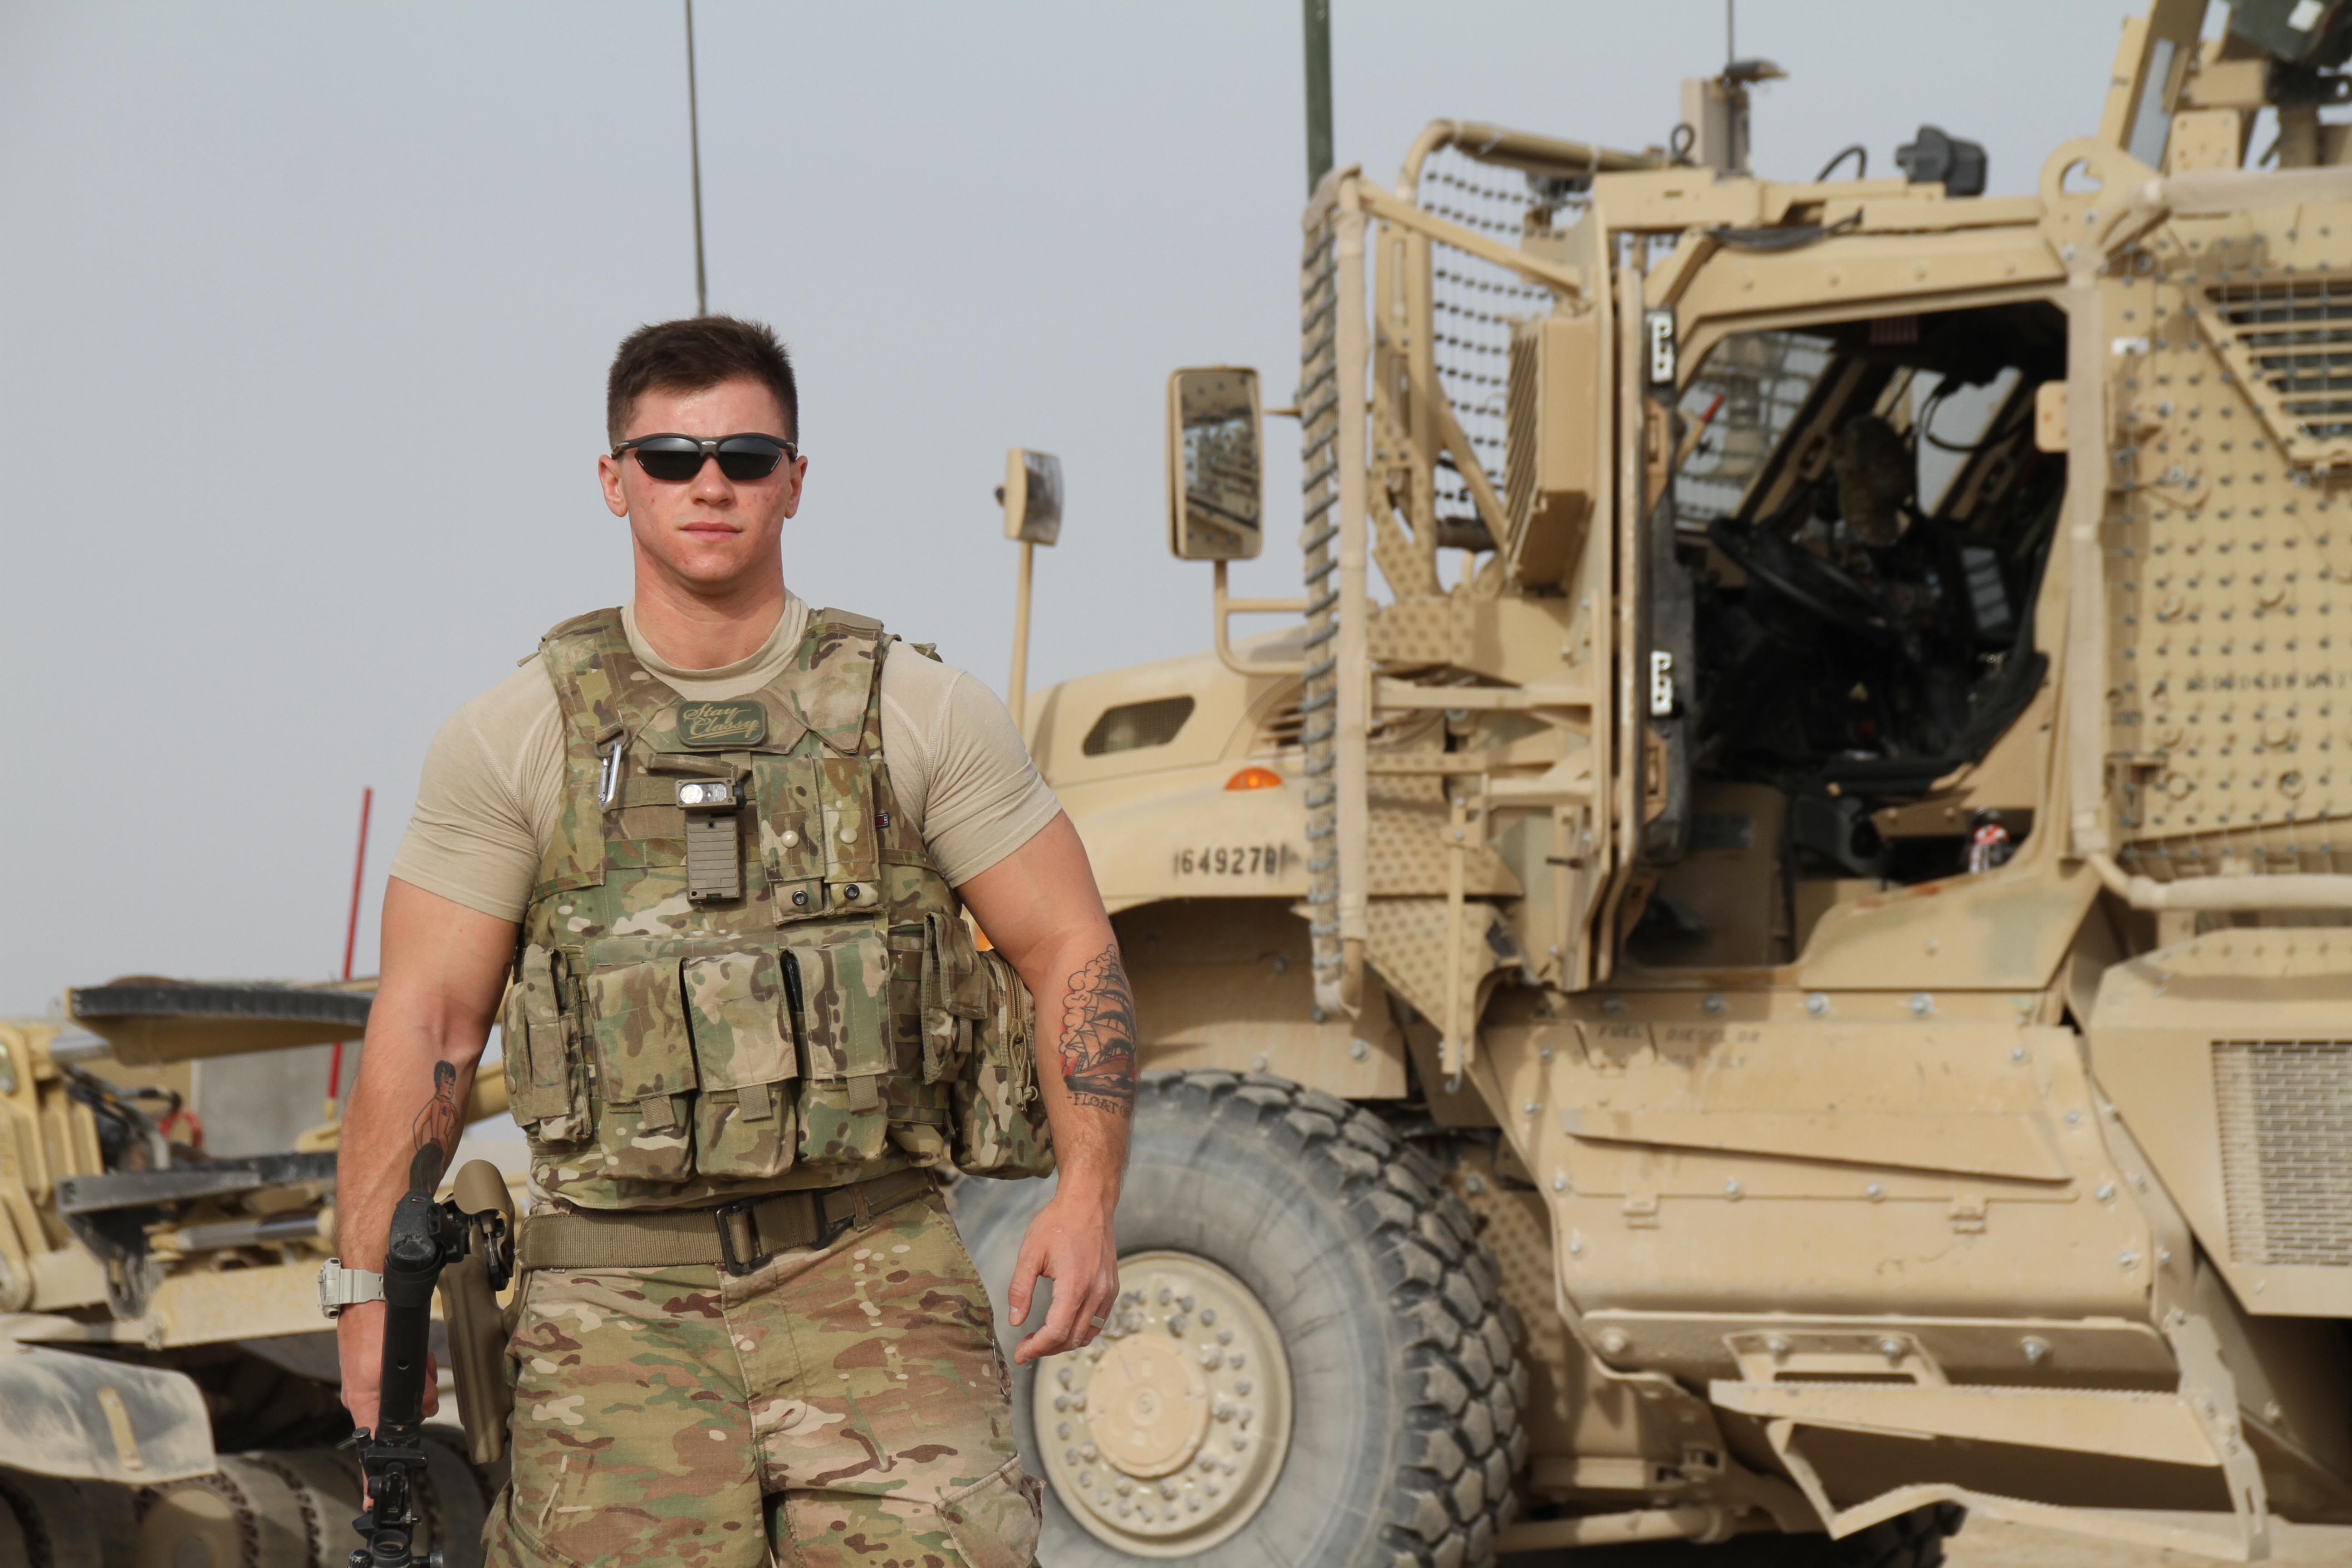 transgender airman praises policy